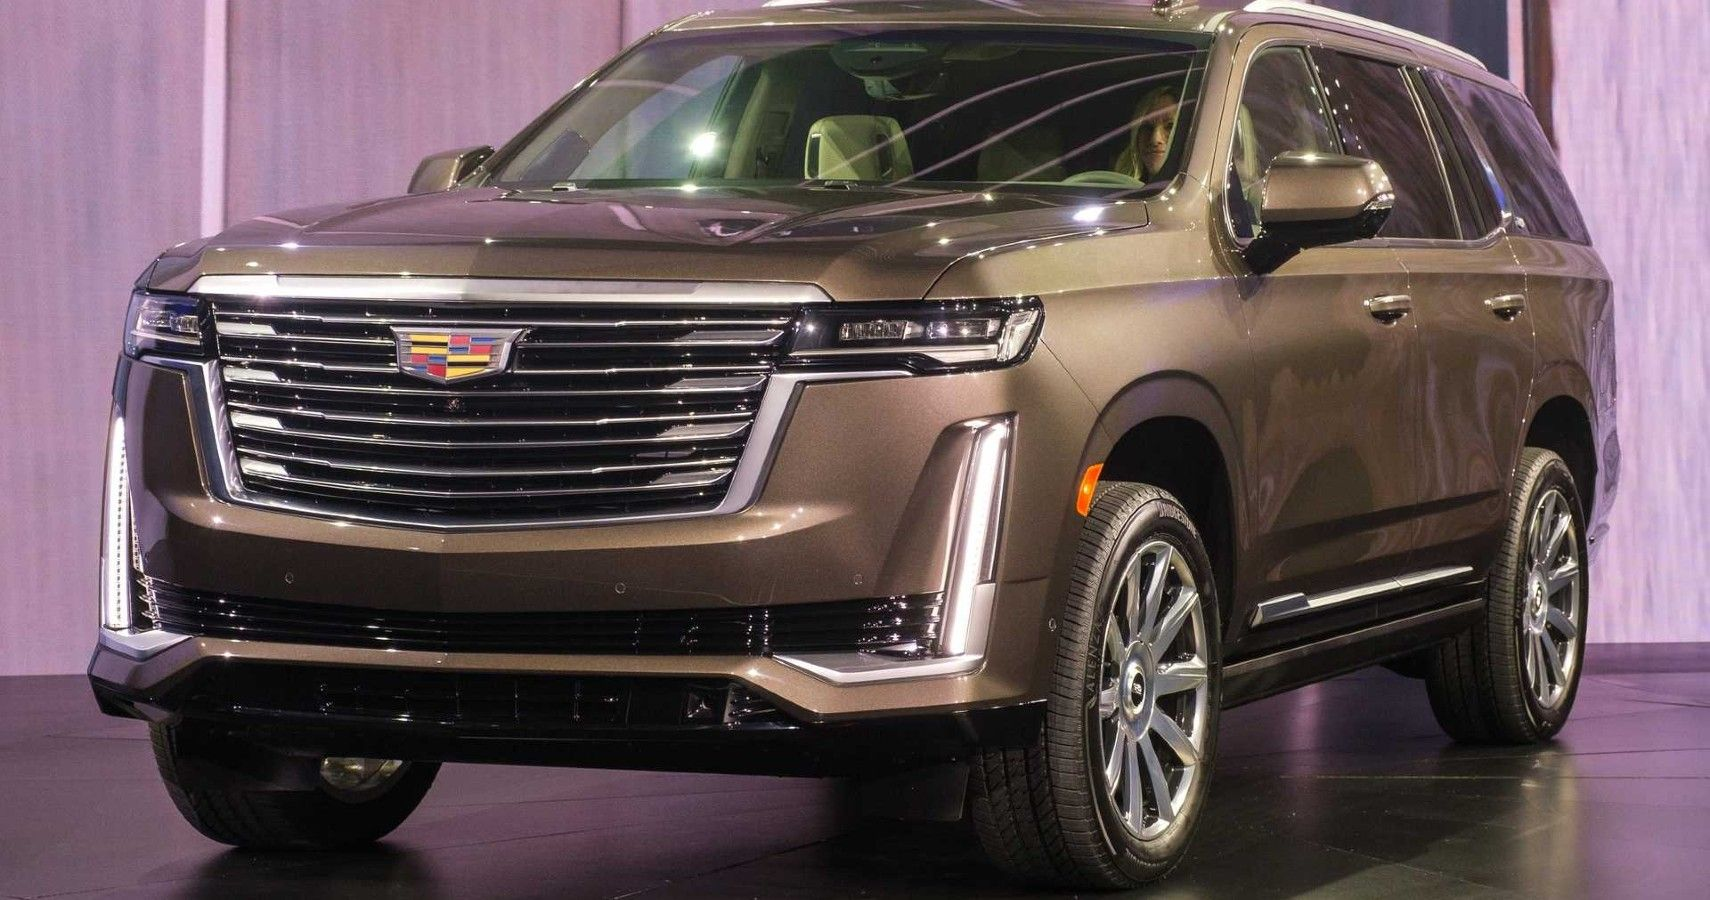 2021 Cadillac Escalade Offers Cutting Edge Tech, Big Power